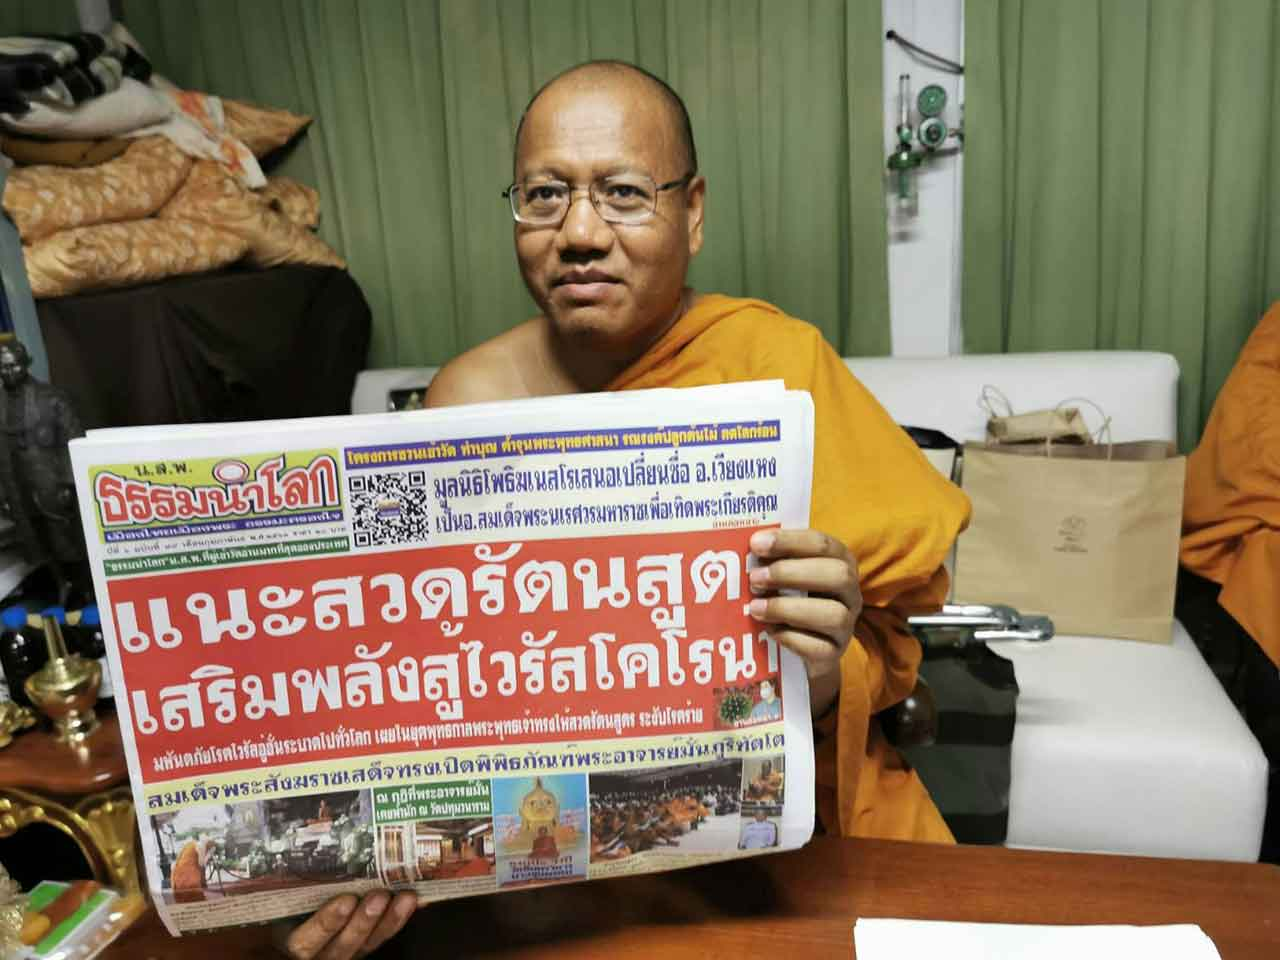 rattanaprit-chanting-2020-pranom-thammalangaro-feb11-march11-news.jpg